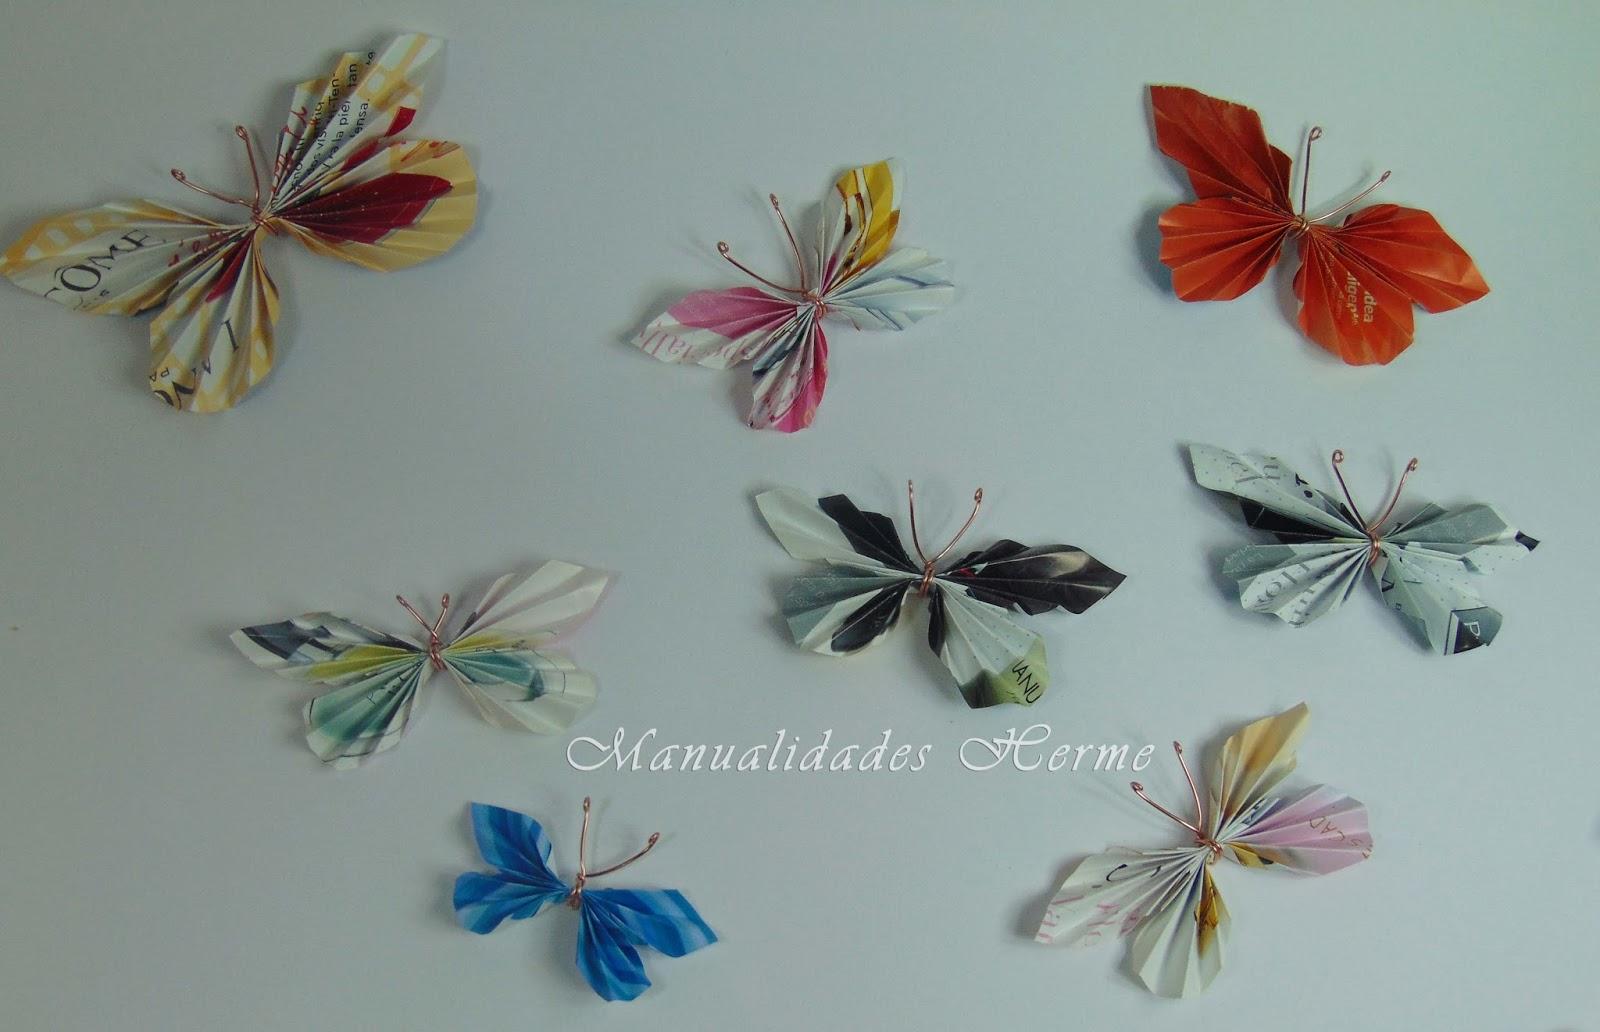 Manualidades herme hacer mariposas con papel de revista - Como hacer mariposas de papel para decorar paredes ...